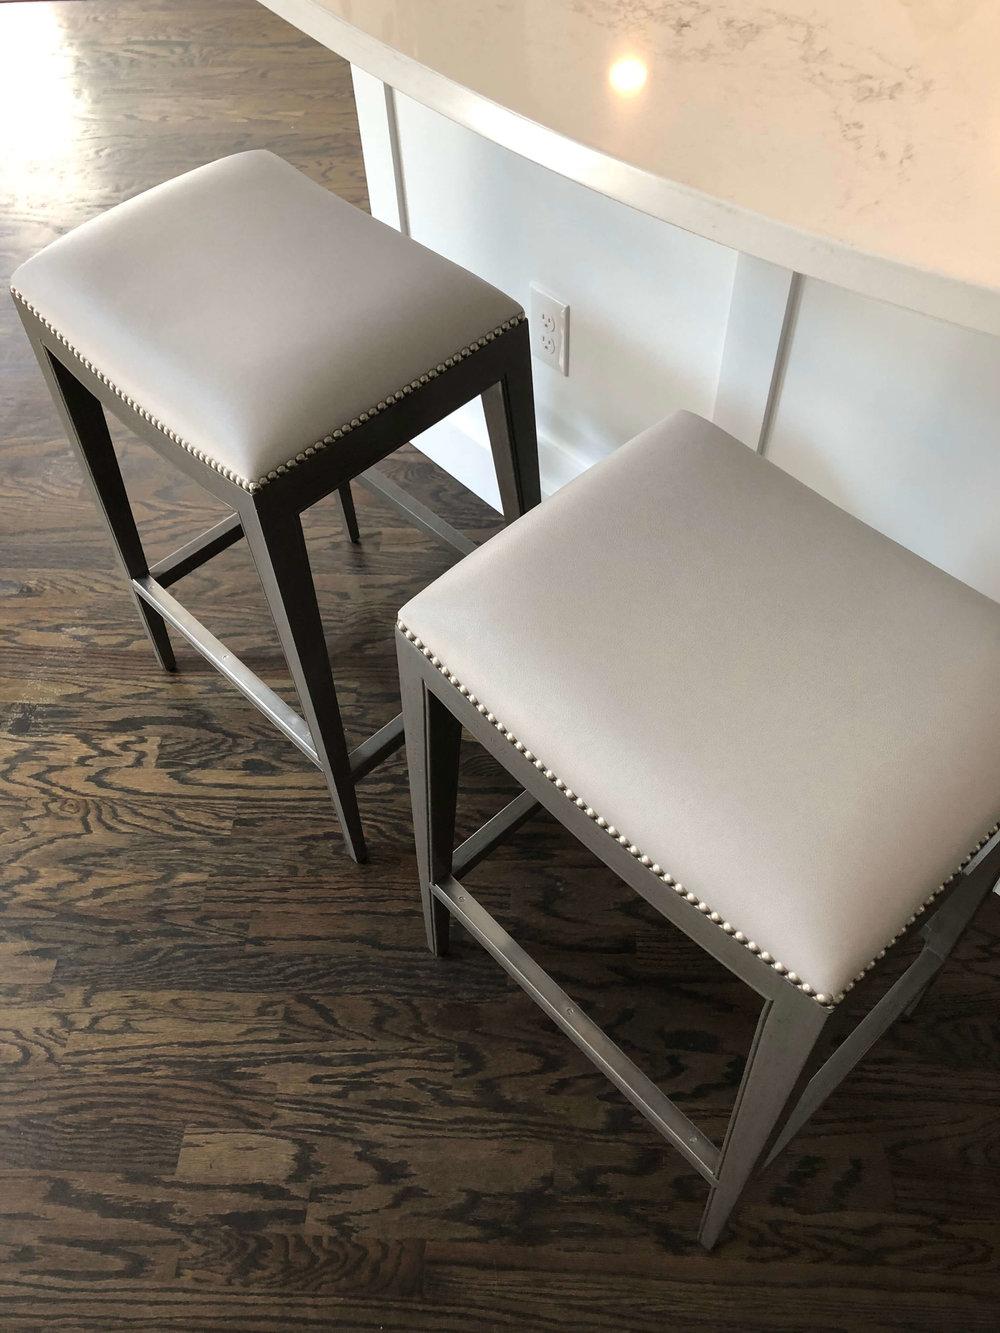 PROJECT SNEAK PEEKS | Bar stools with vinyl seats for durability | Carla Aston, Designer